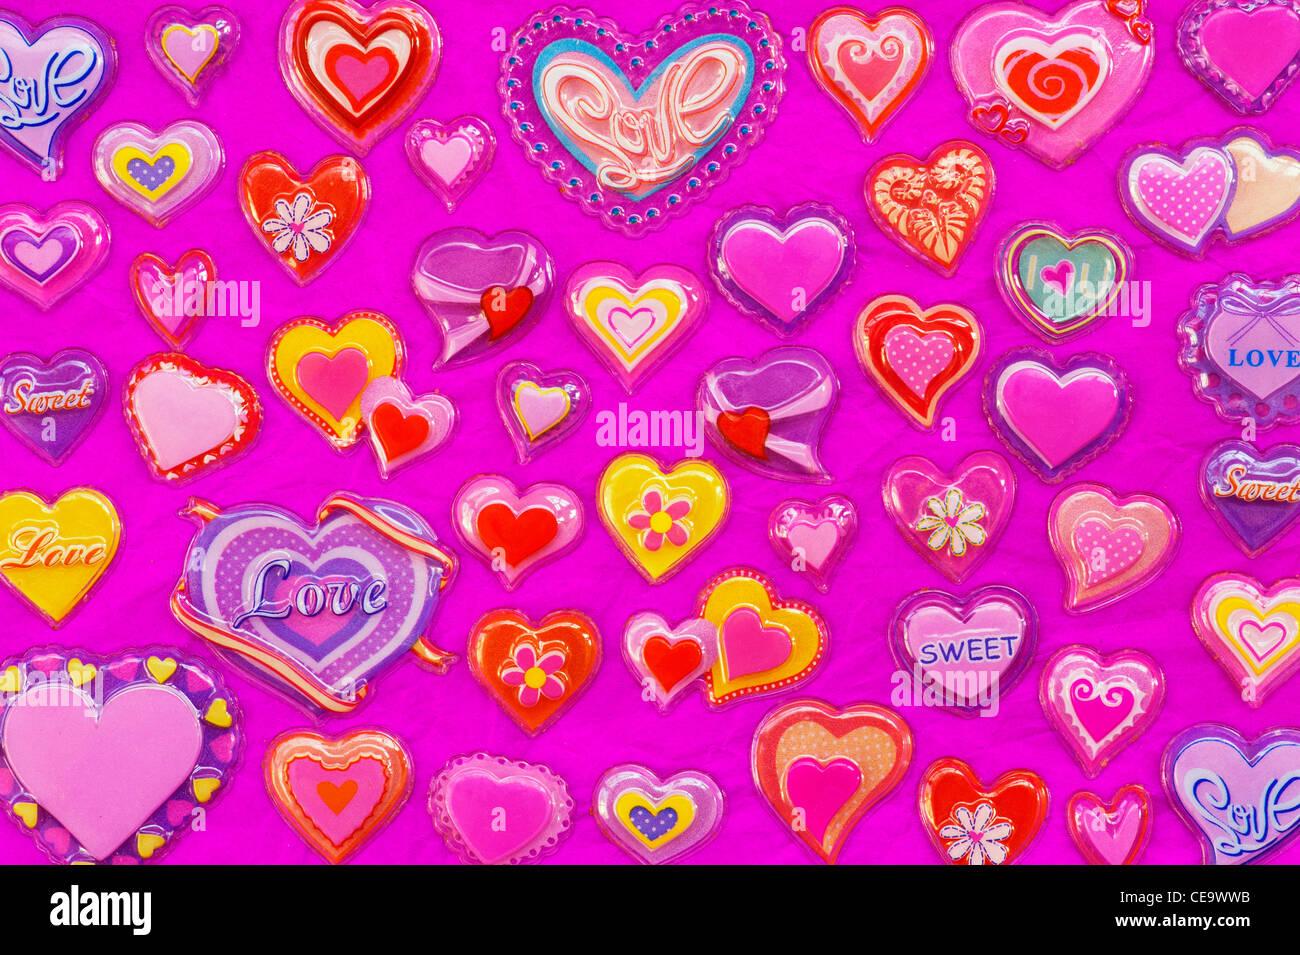 Plastic Love Hearts - Stock Image